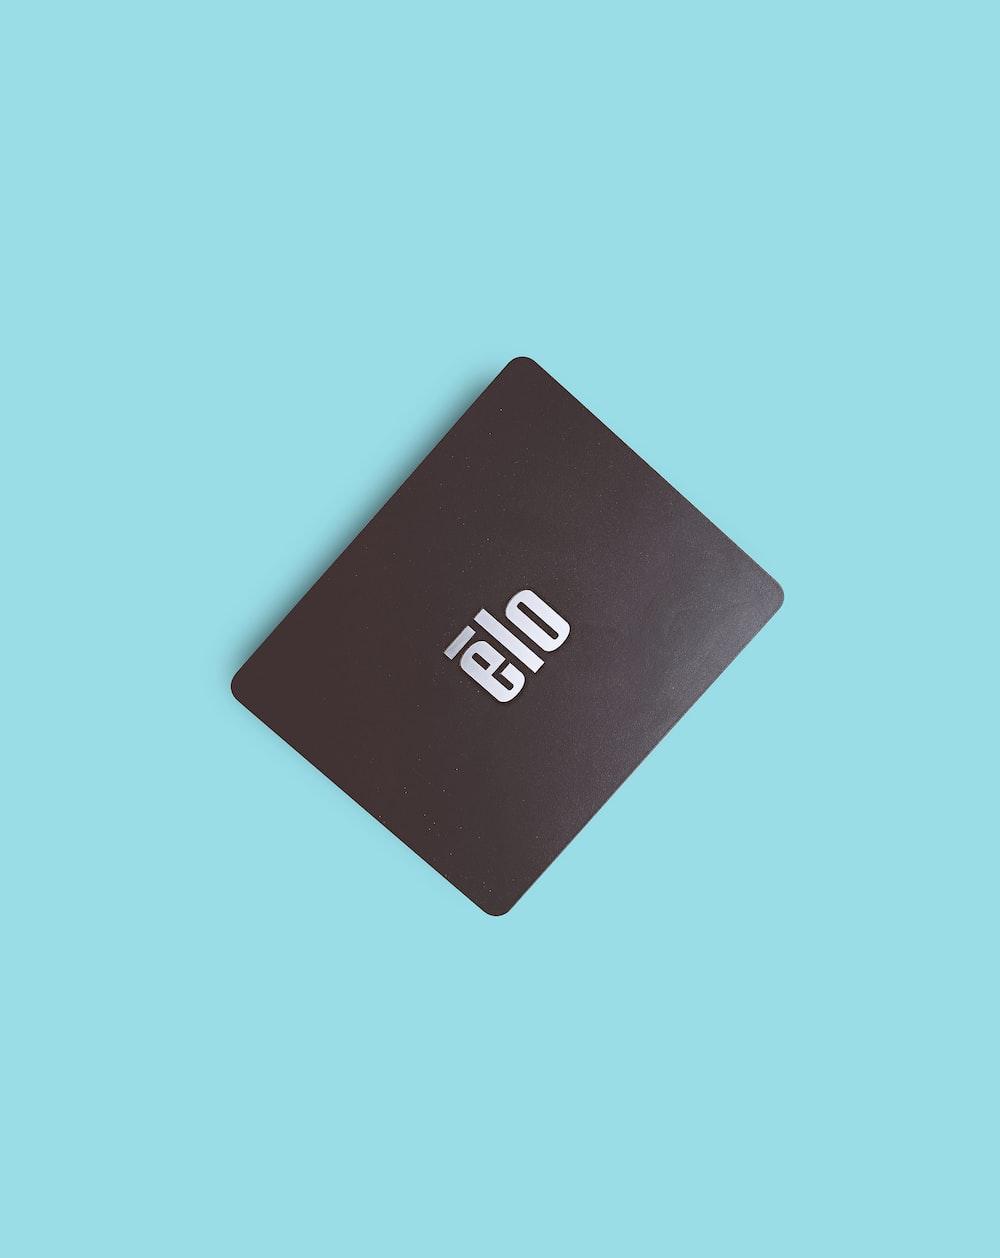 black Elo device